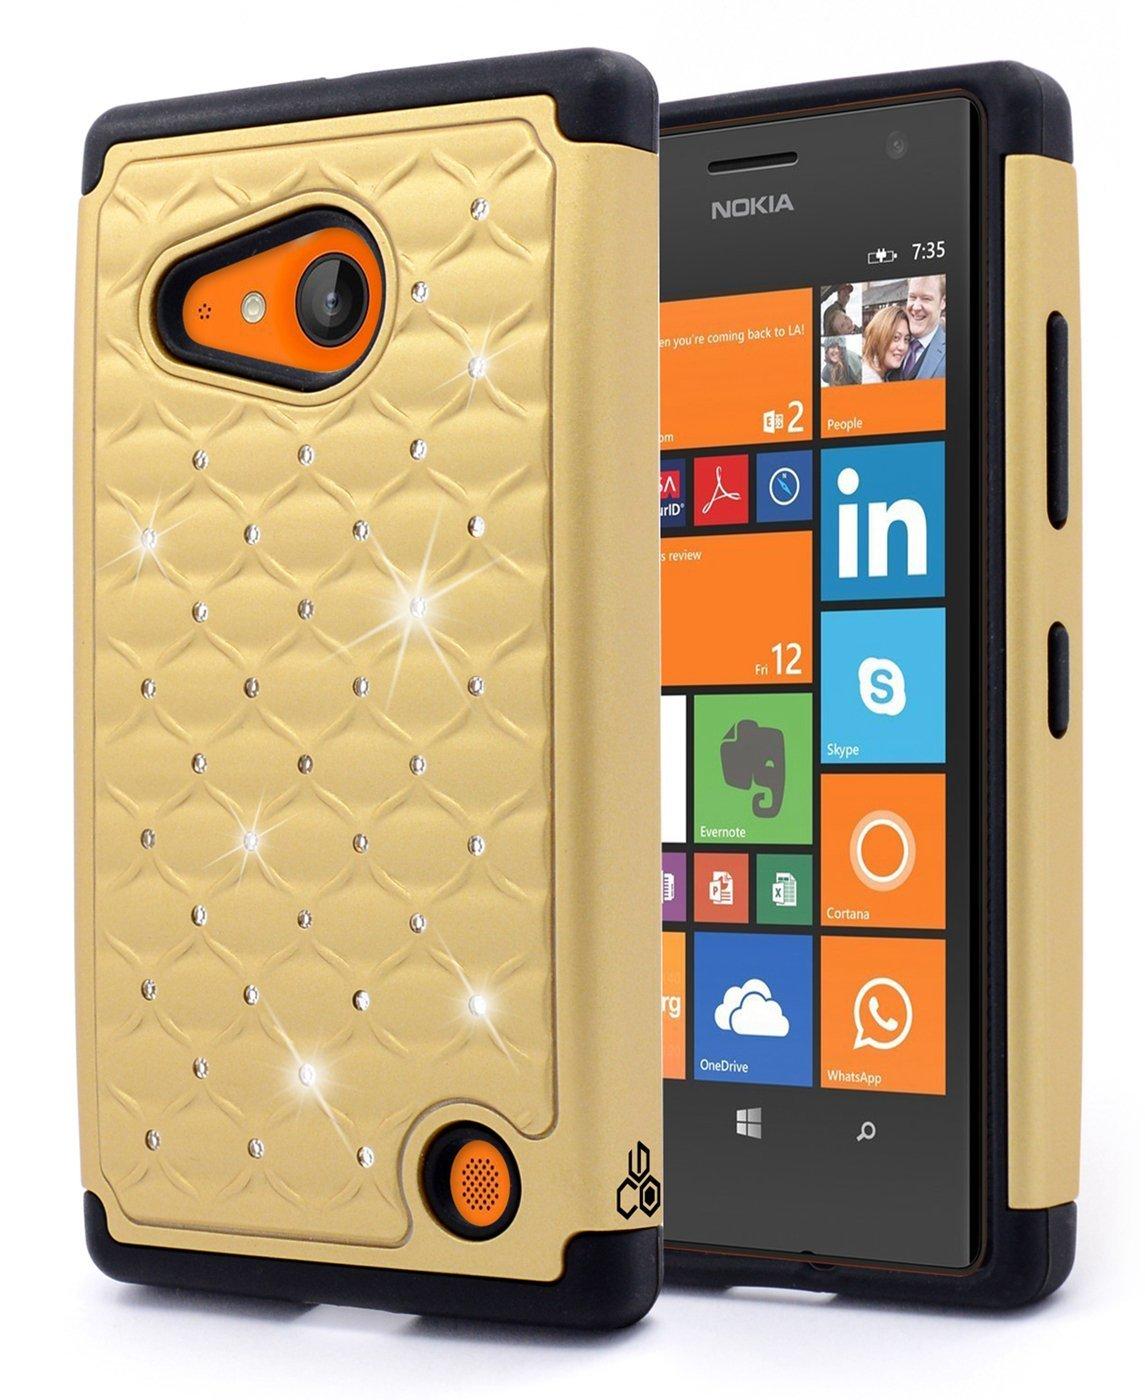 Bling Black Premium Durable Hard/&Soft Hybrid Gel Rhinestone Bling Armor Defender Case for Nokia Lumia 635【Storm Buy】 Nokia Lumia 635 Case